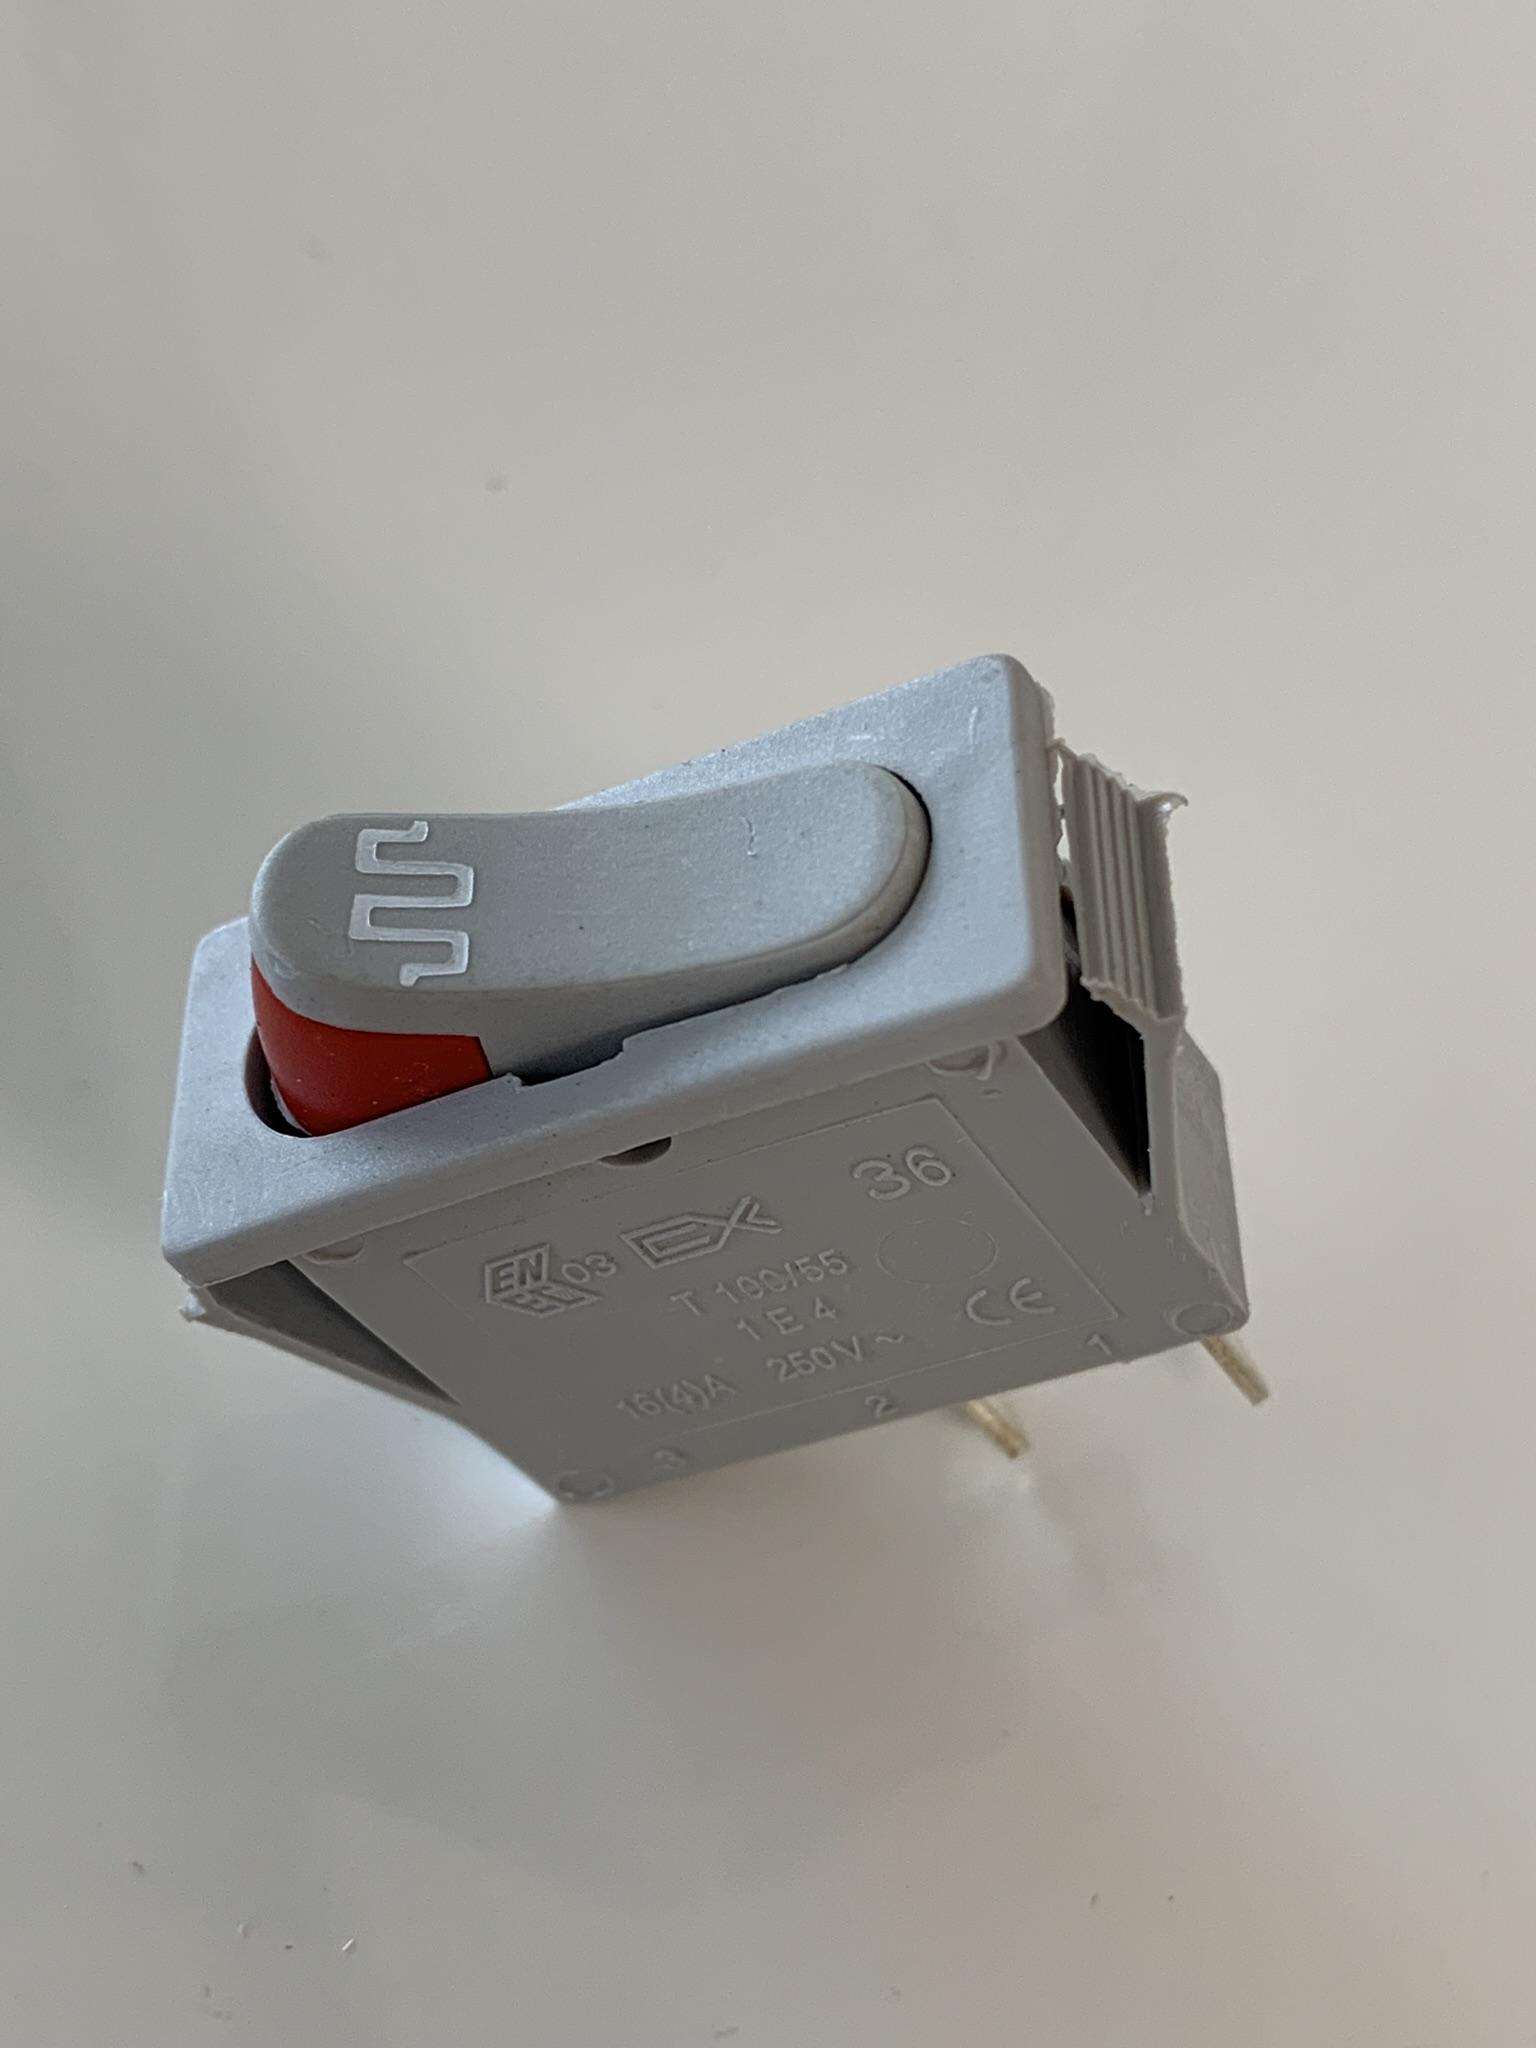 interrupteur de soudure reber